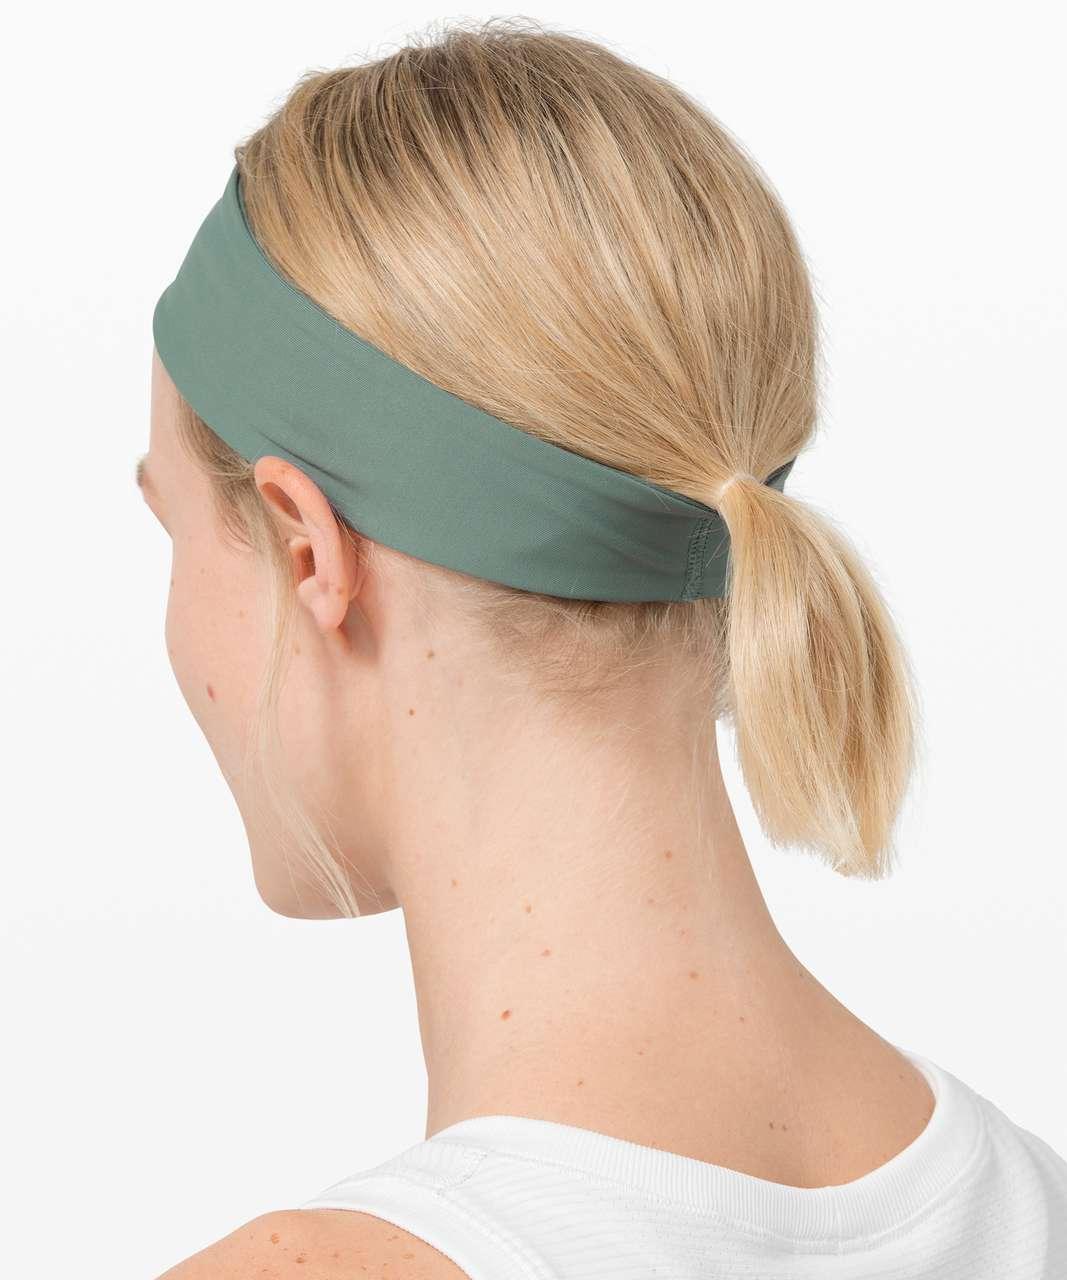 Lululemon Fly Away Tamer Headband II - Tidewater Teal